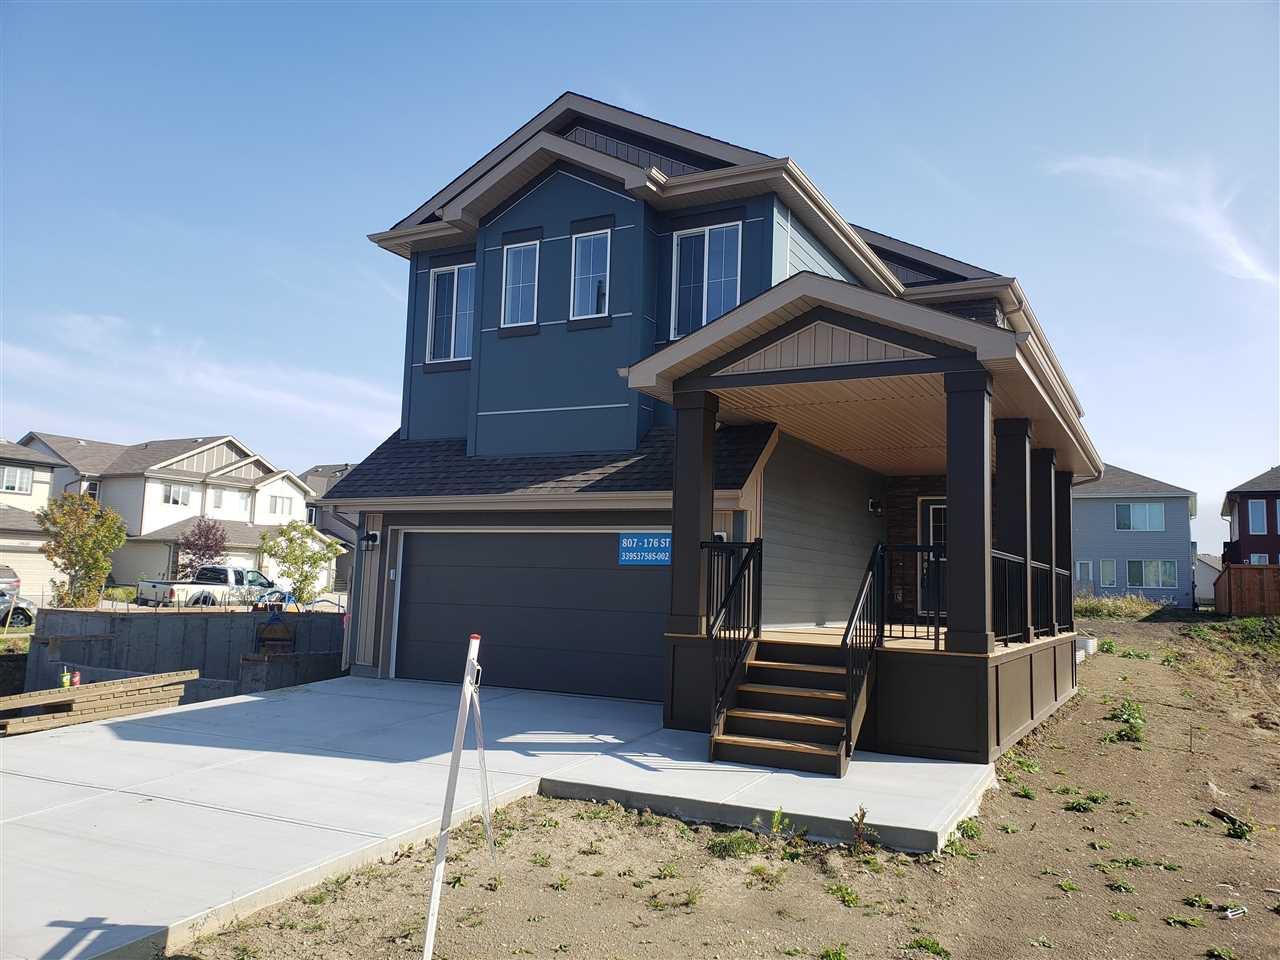 Main Photo: 807 176 Street in Edmonton: Zone 56 House for sale : MLS®# E4218613